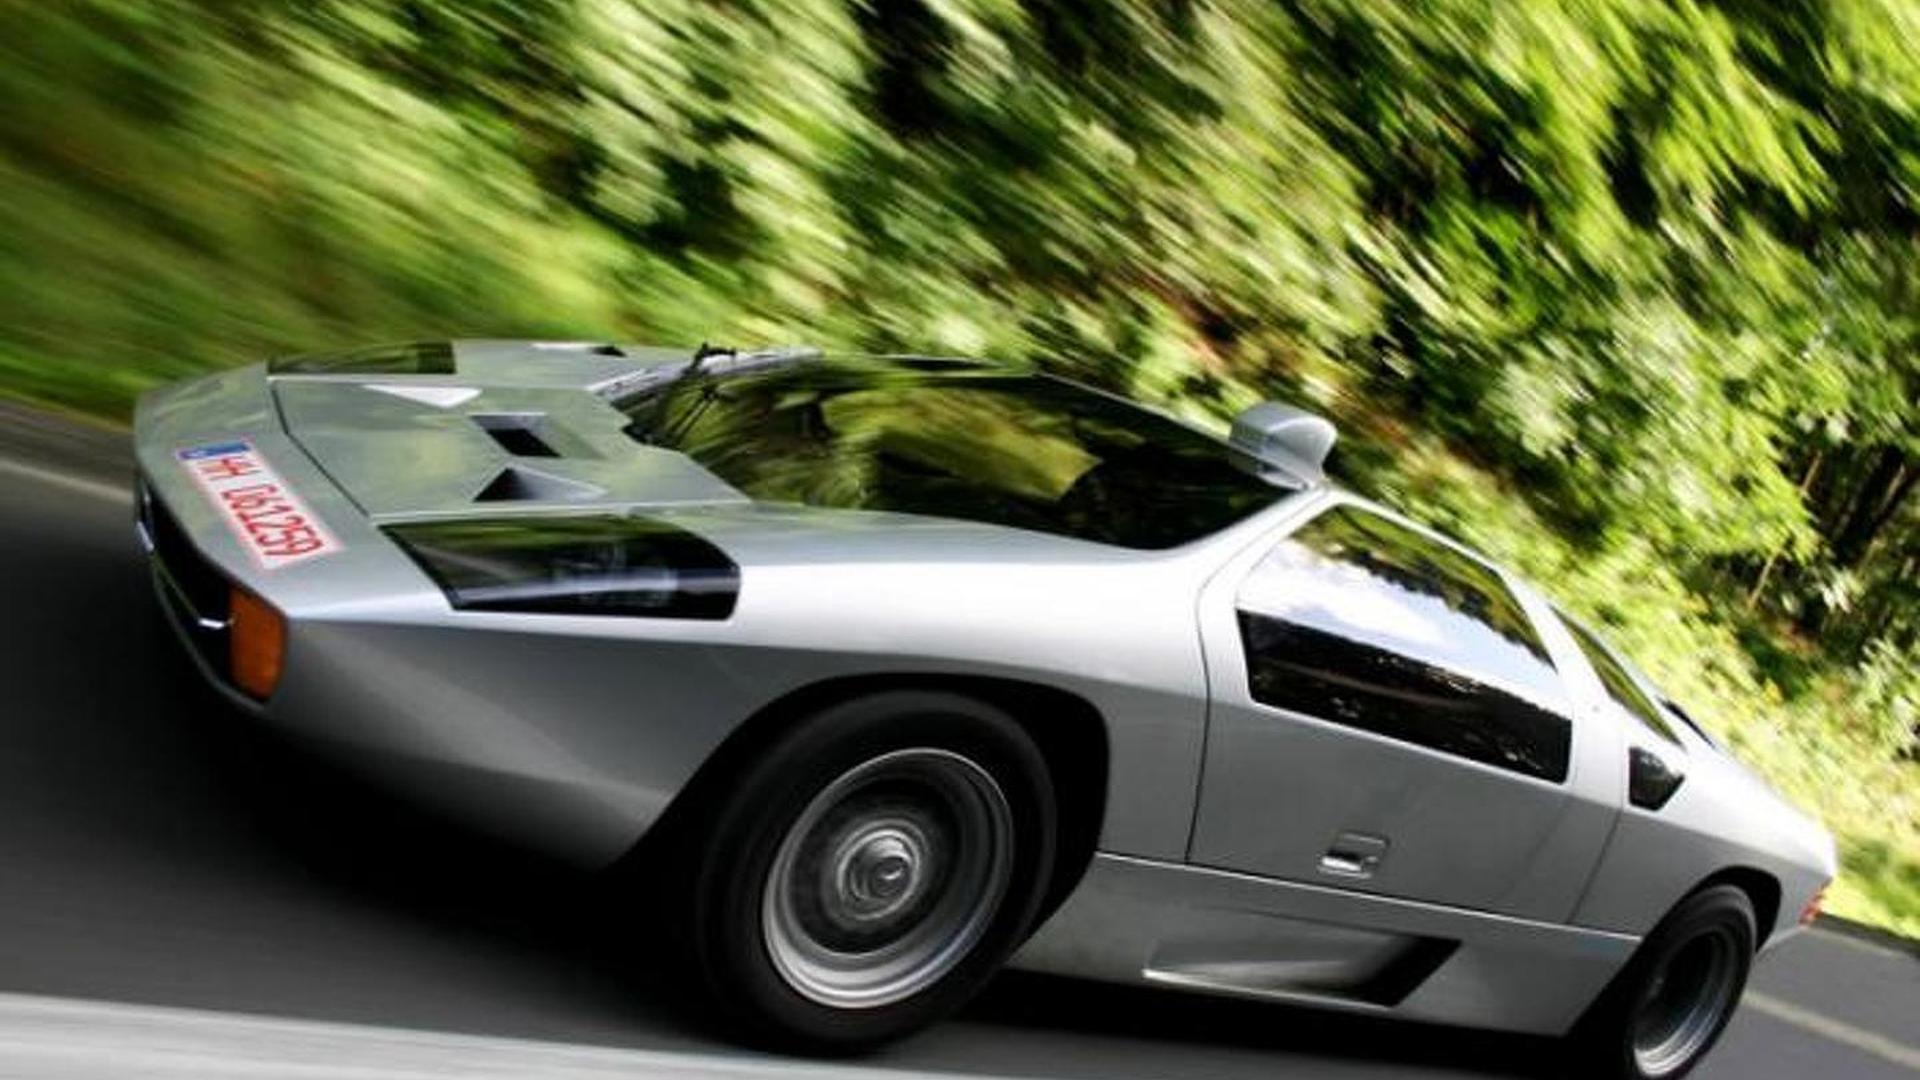 Isdera Imperator 108i revs its AMG V8 6 0-liter engine at